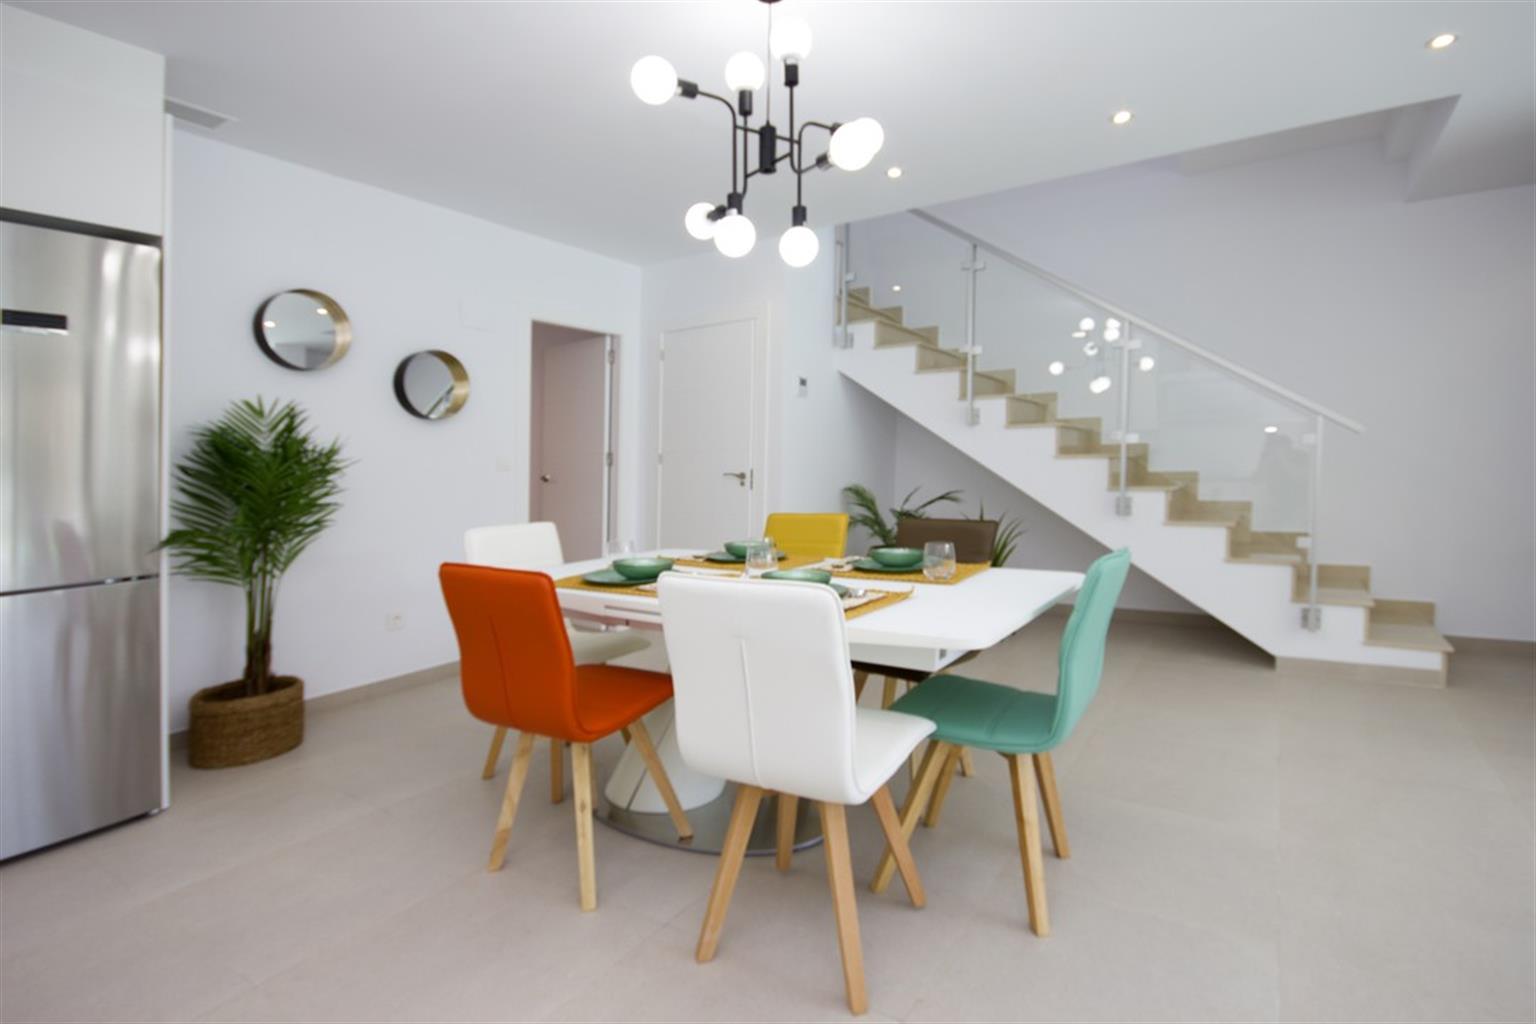 Maison - Almoradi  - #4231529-35